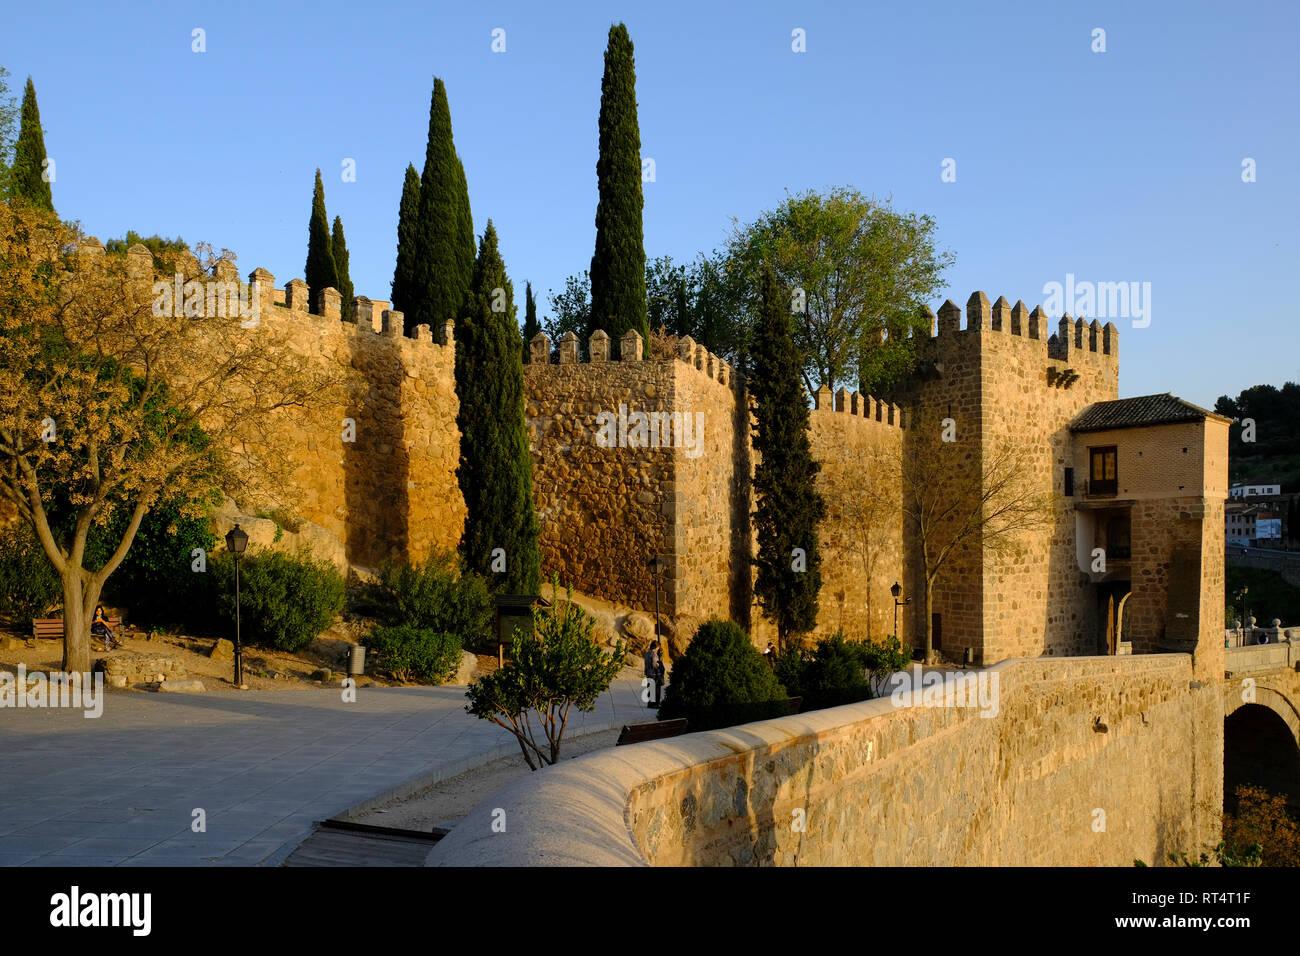 town wall, Toledo, Castilla la Mancha, Spain Stock Photo